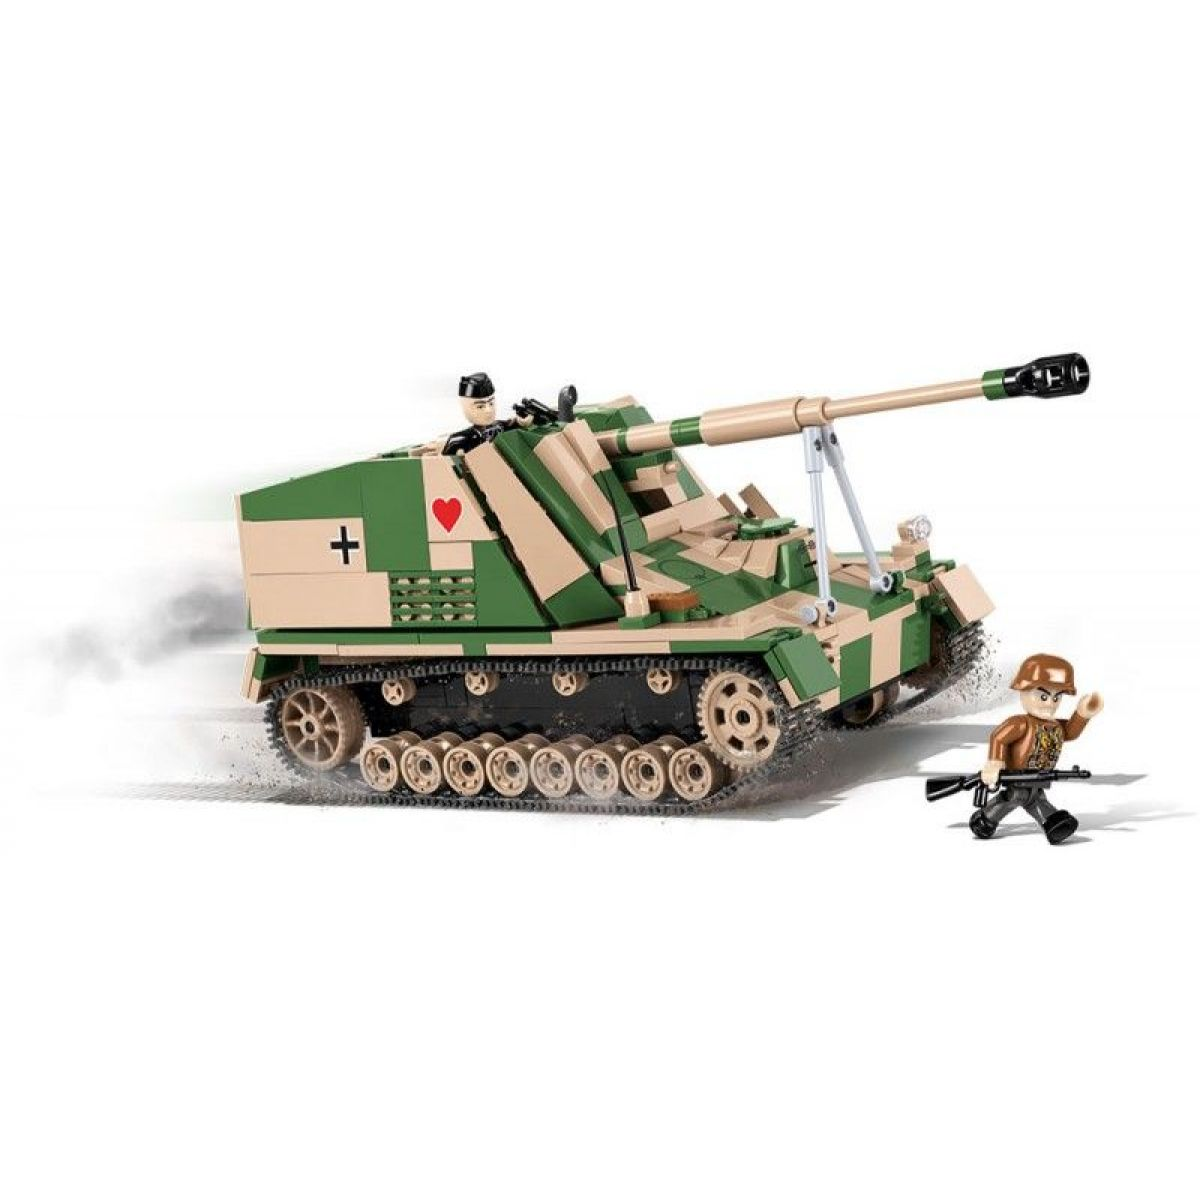 Cobi 2517 Malá armáda II. světová válka Sd Kfz 164 Nashorn